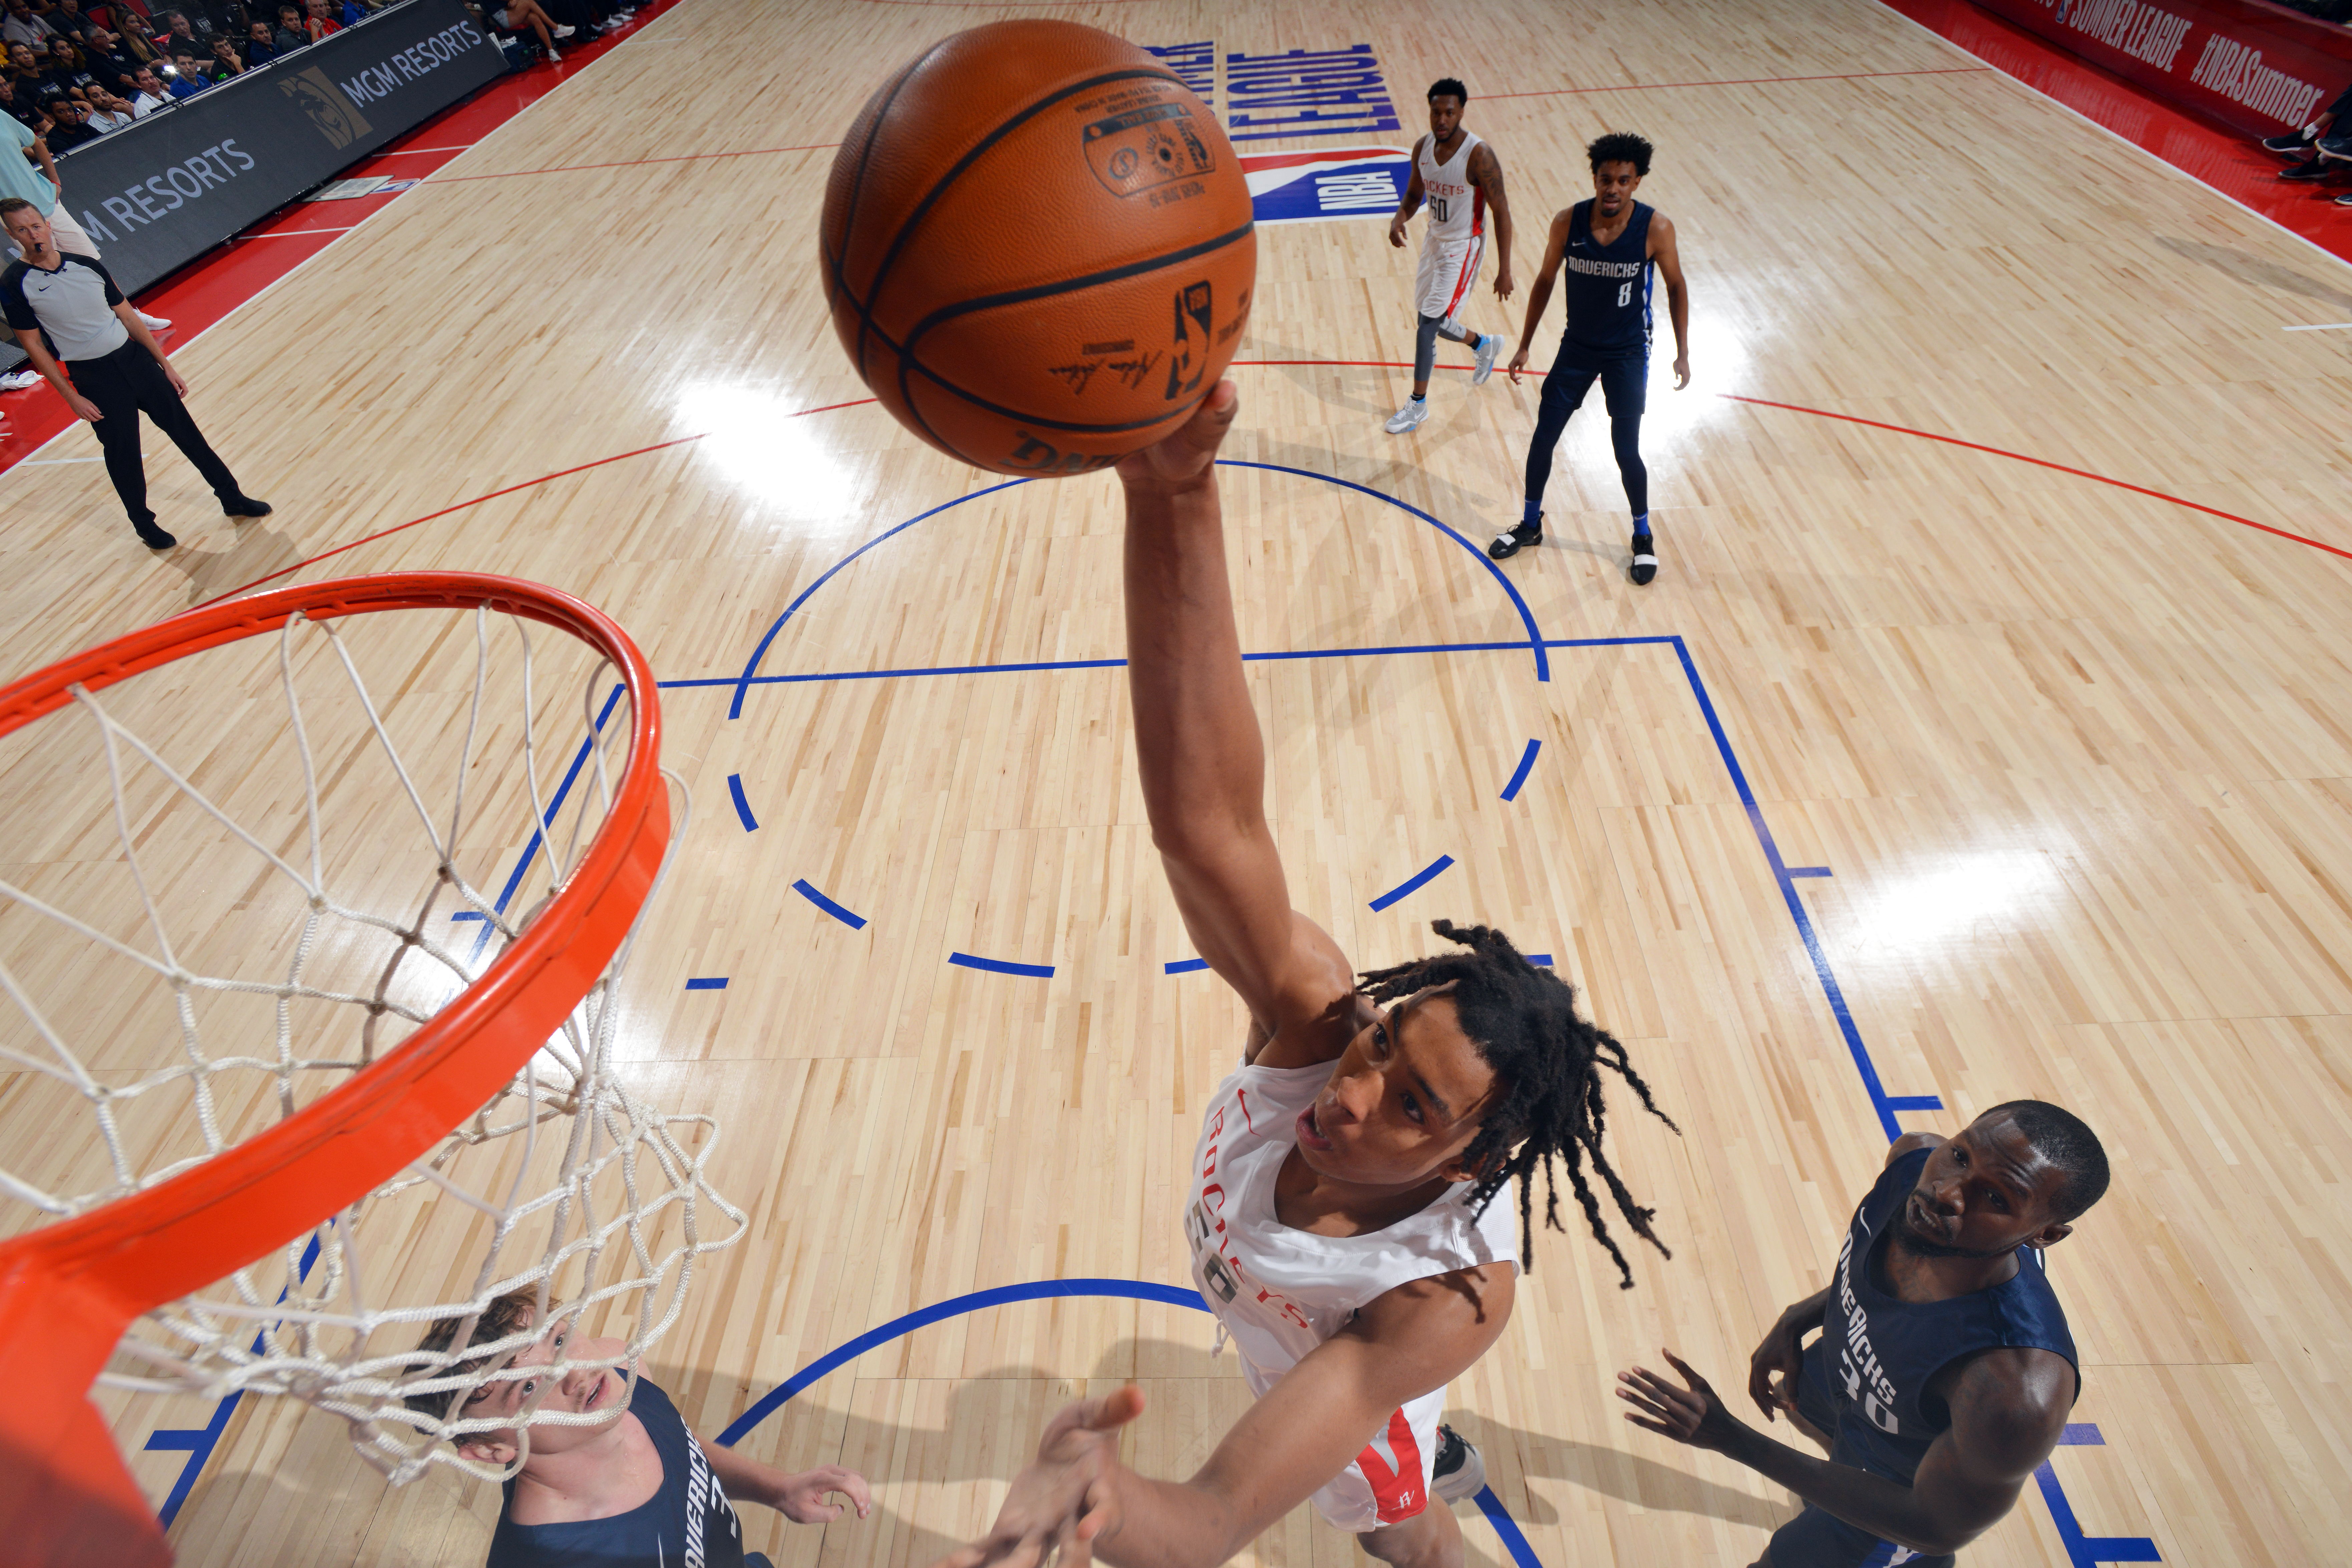 2019 Las Vegas Summer League - Day 2 - Dallas Mavericks v Houston Rockets